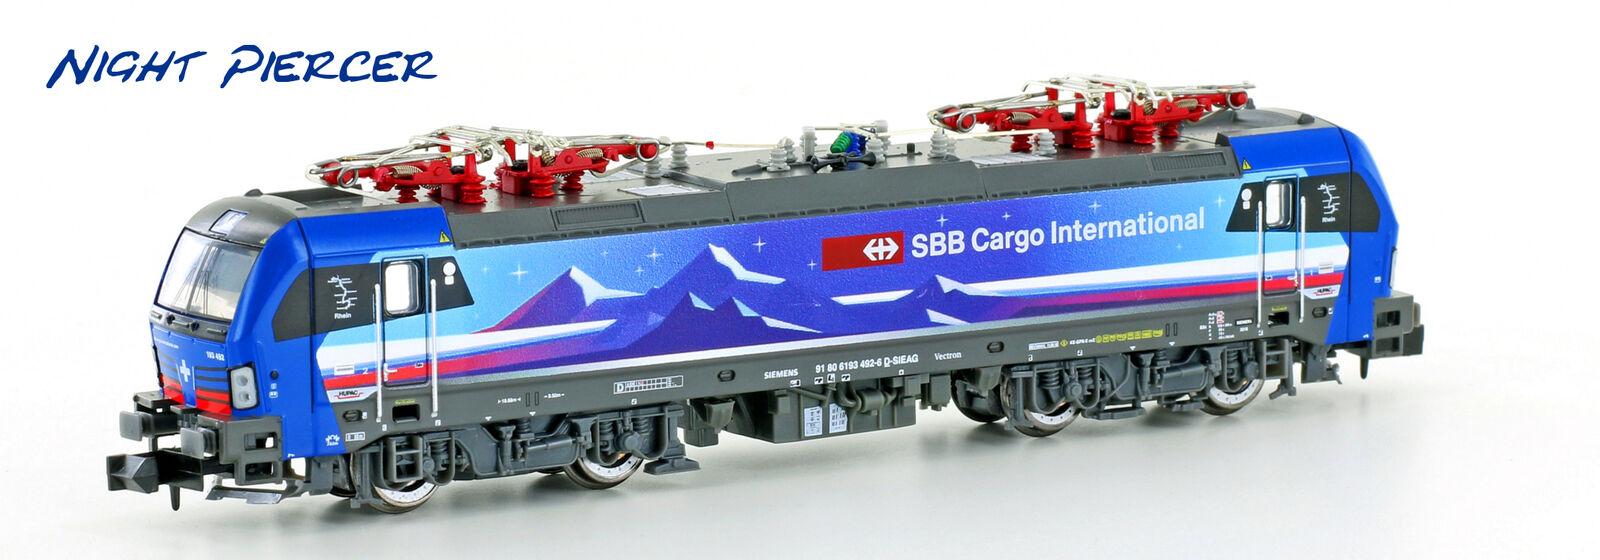 Hobbytrain 2999-01 Electric Locomotive Re475 Vectron SBB Cargo Night Piercer